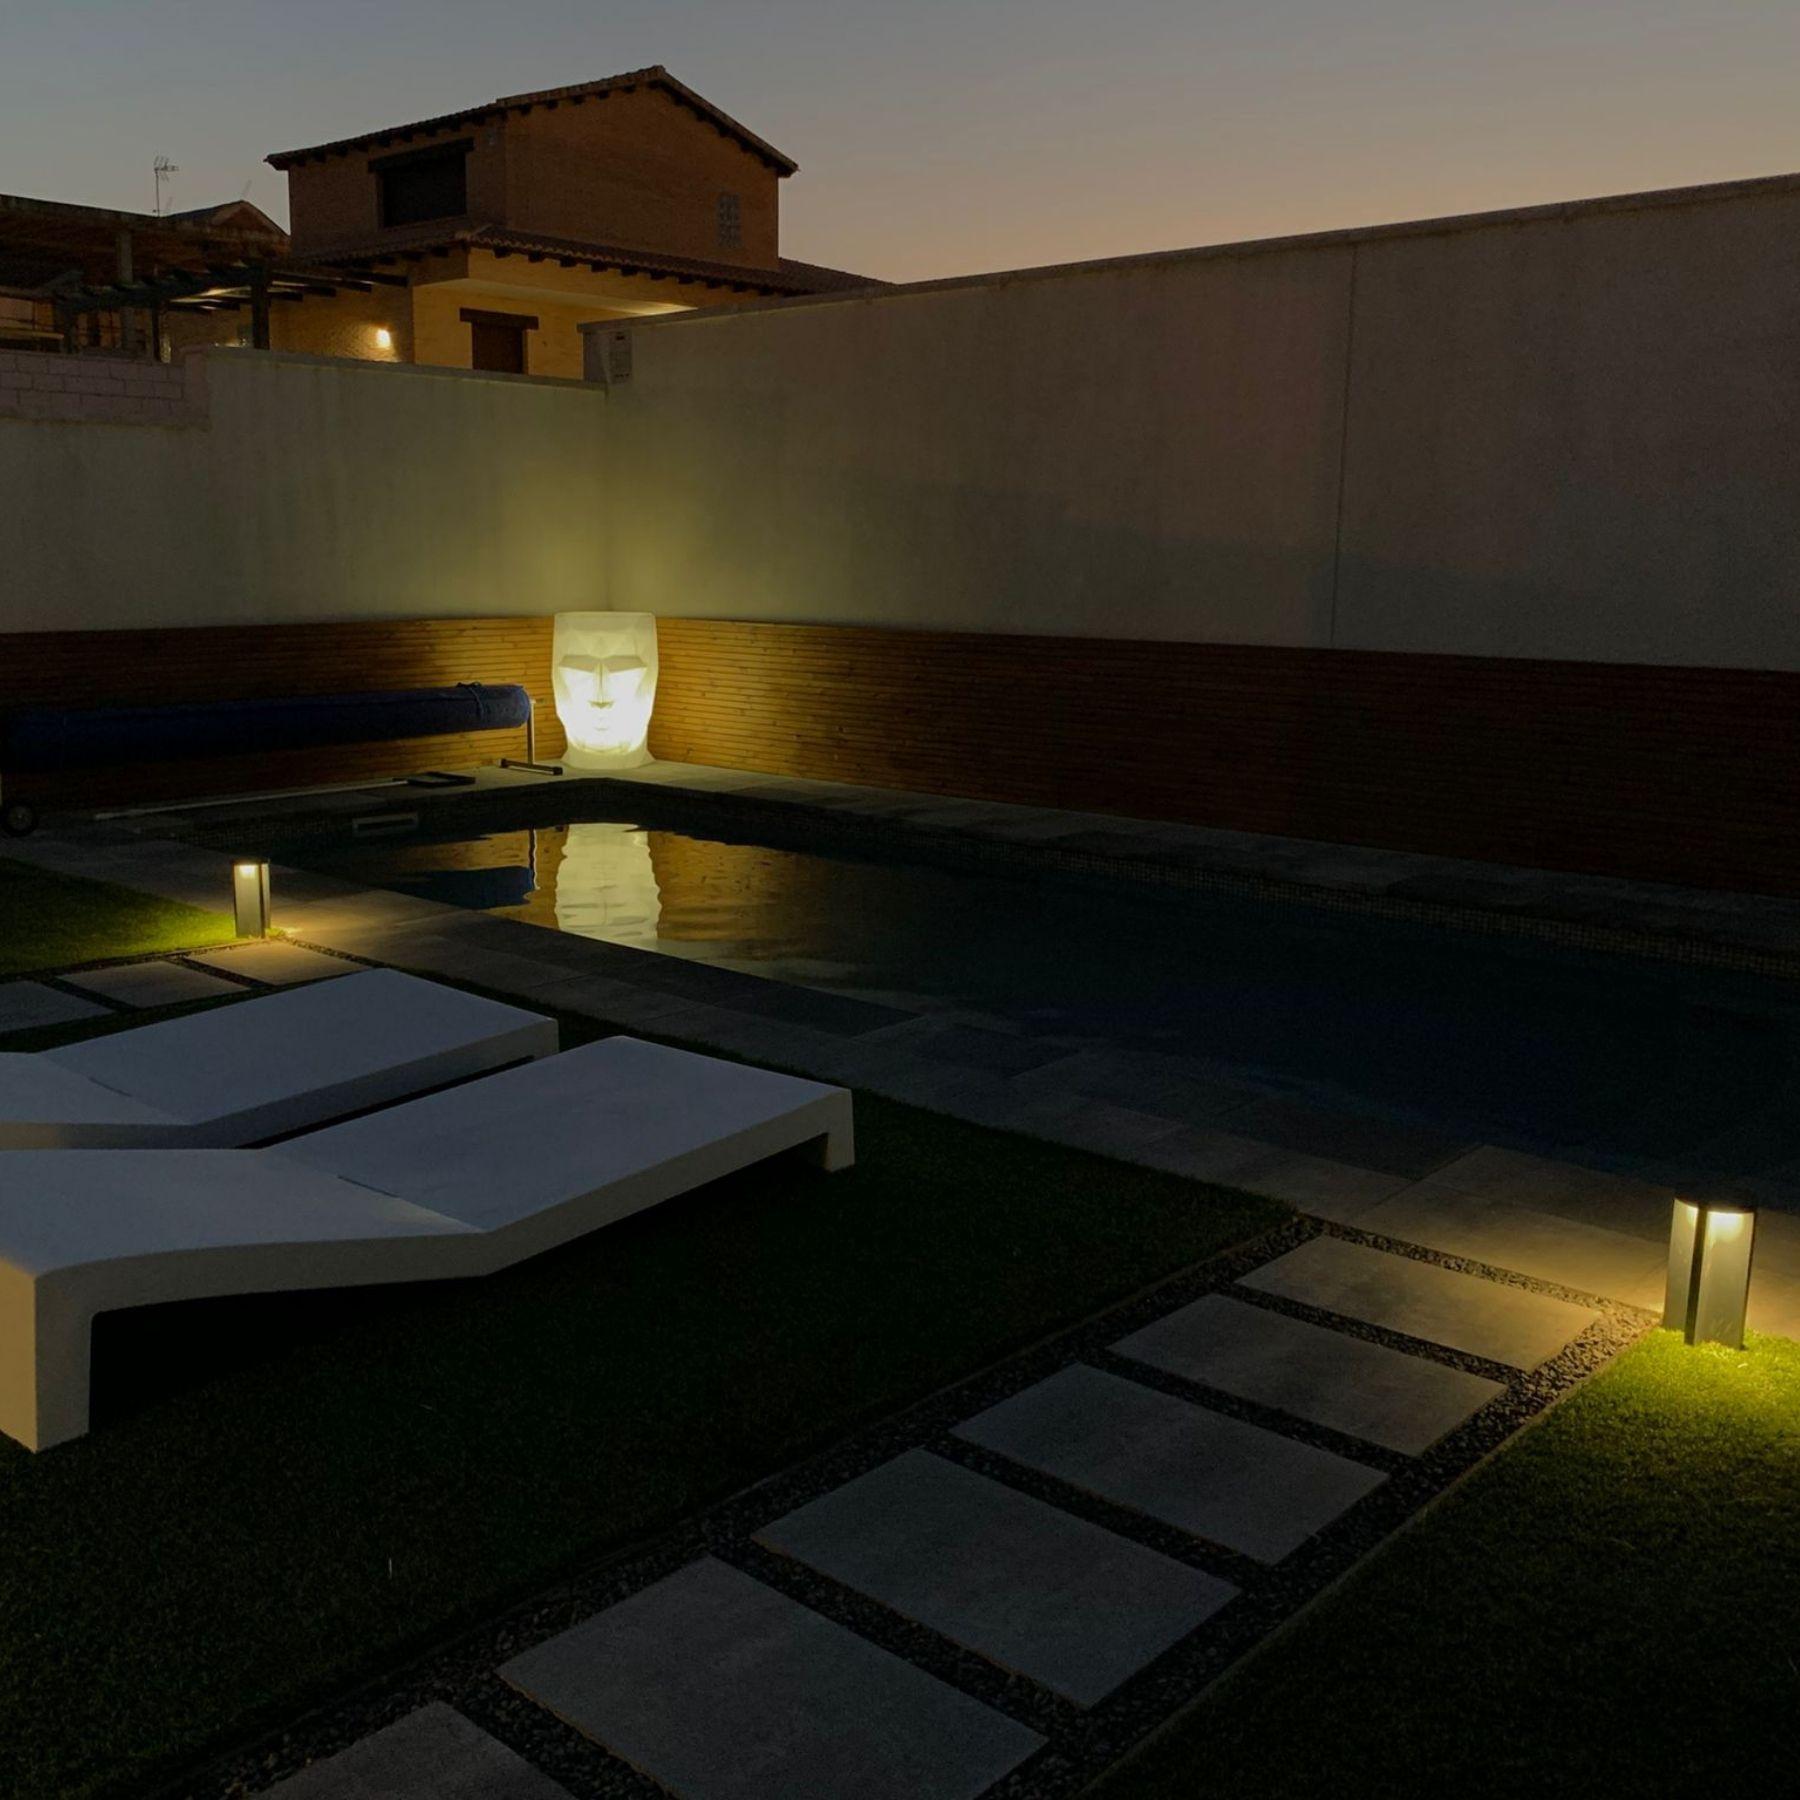 iluminación jardín piscina vivienda chalet